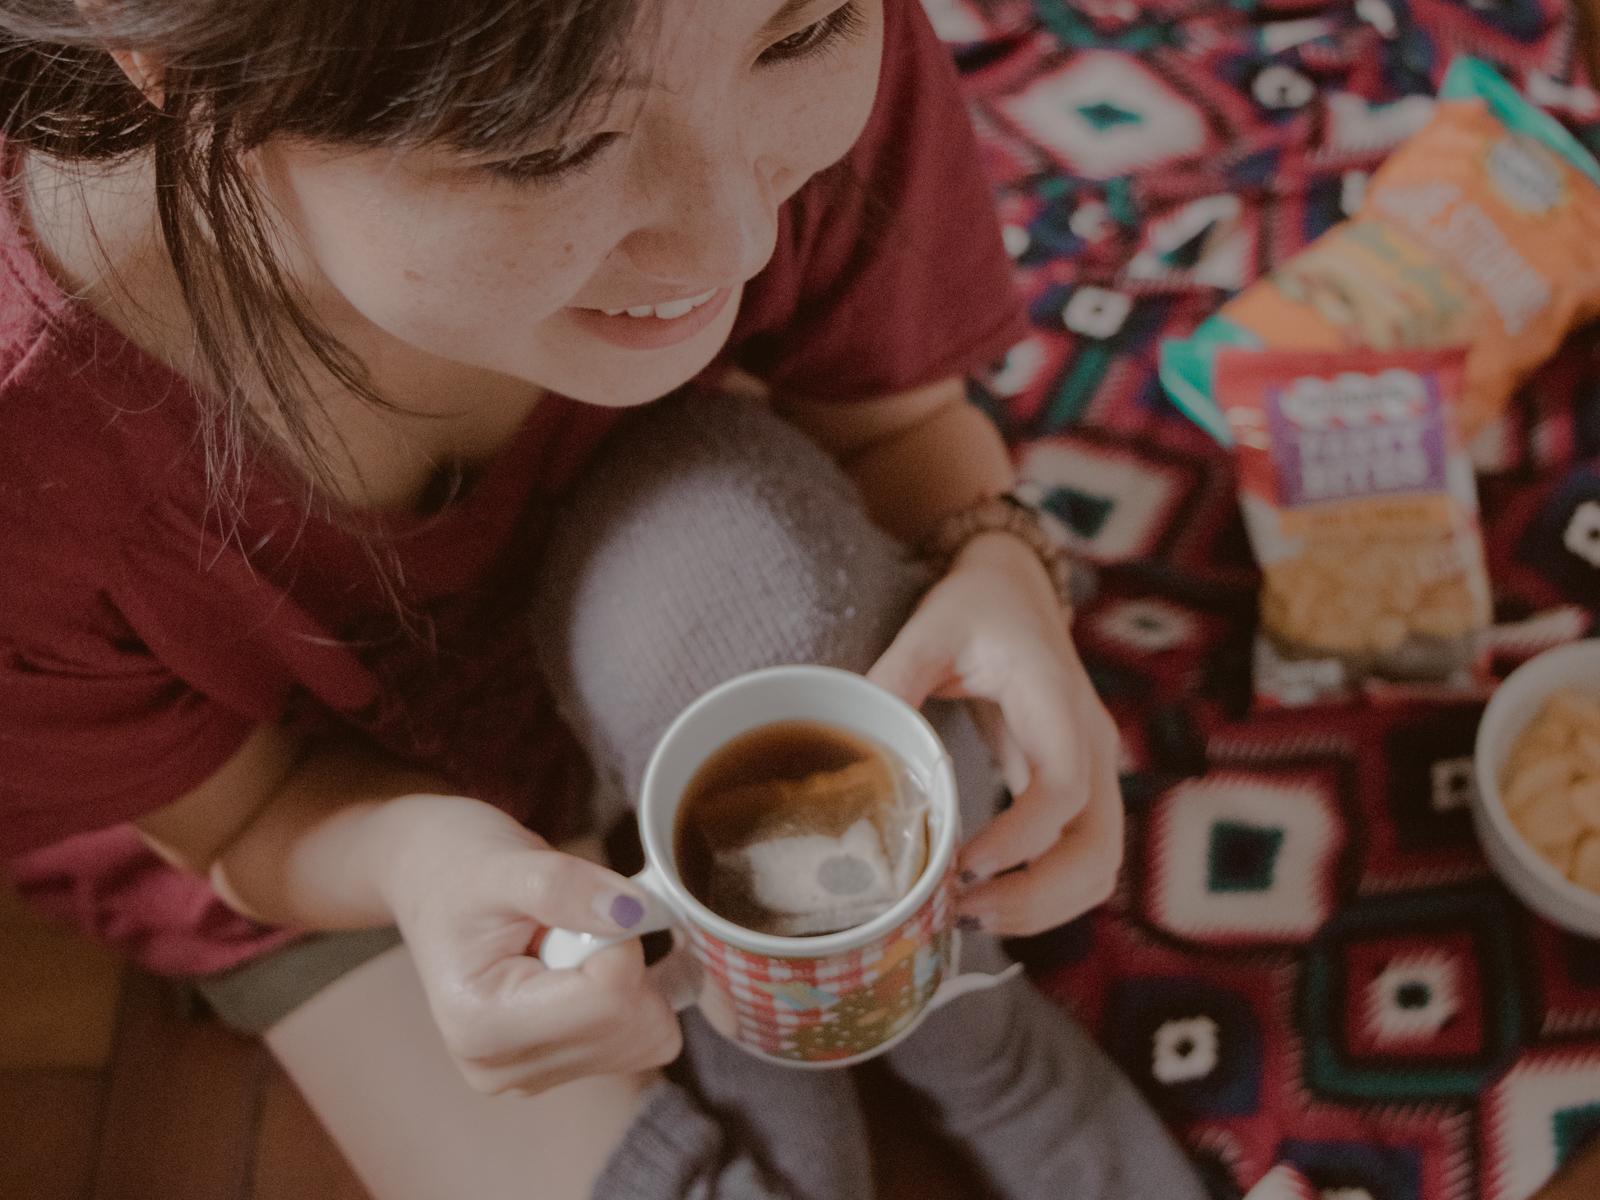 garota tomando chá